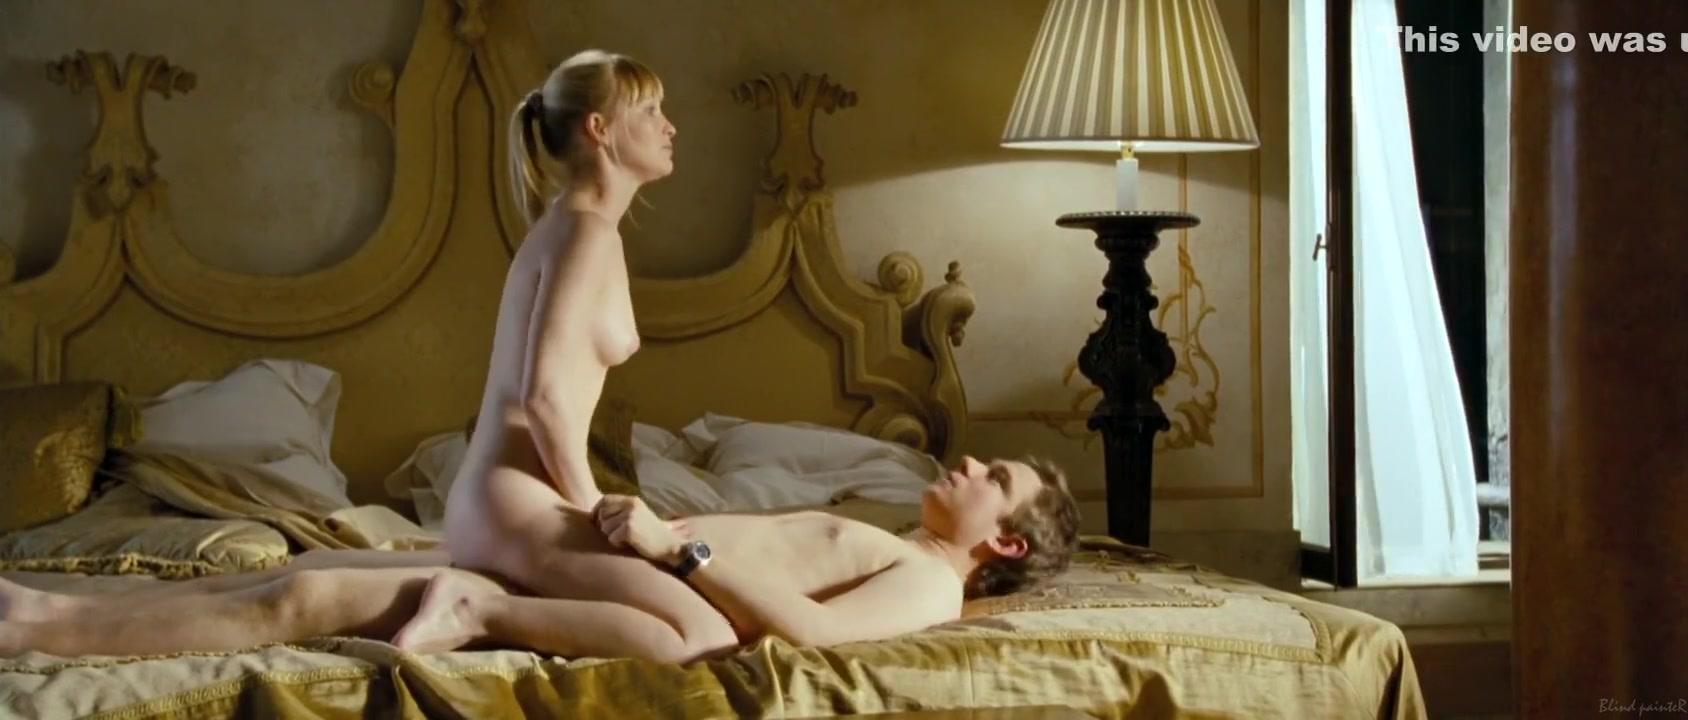 Ebony squirting orgy Full movie